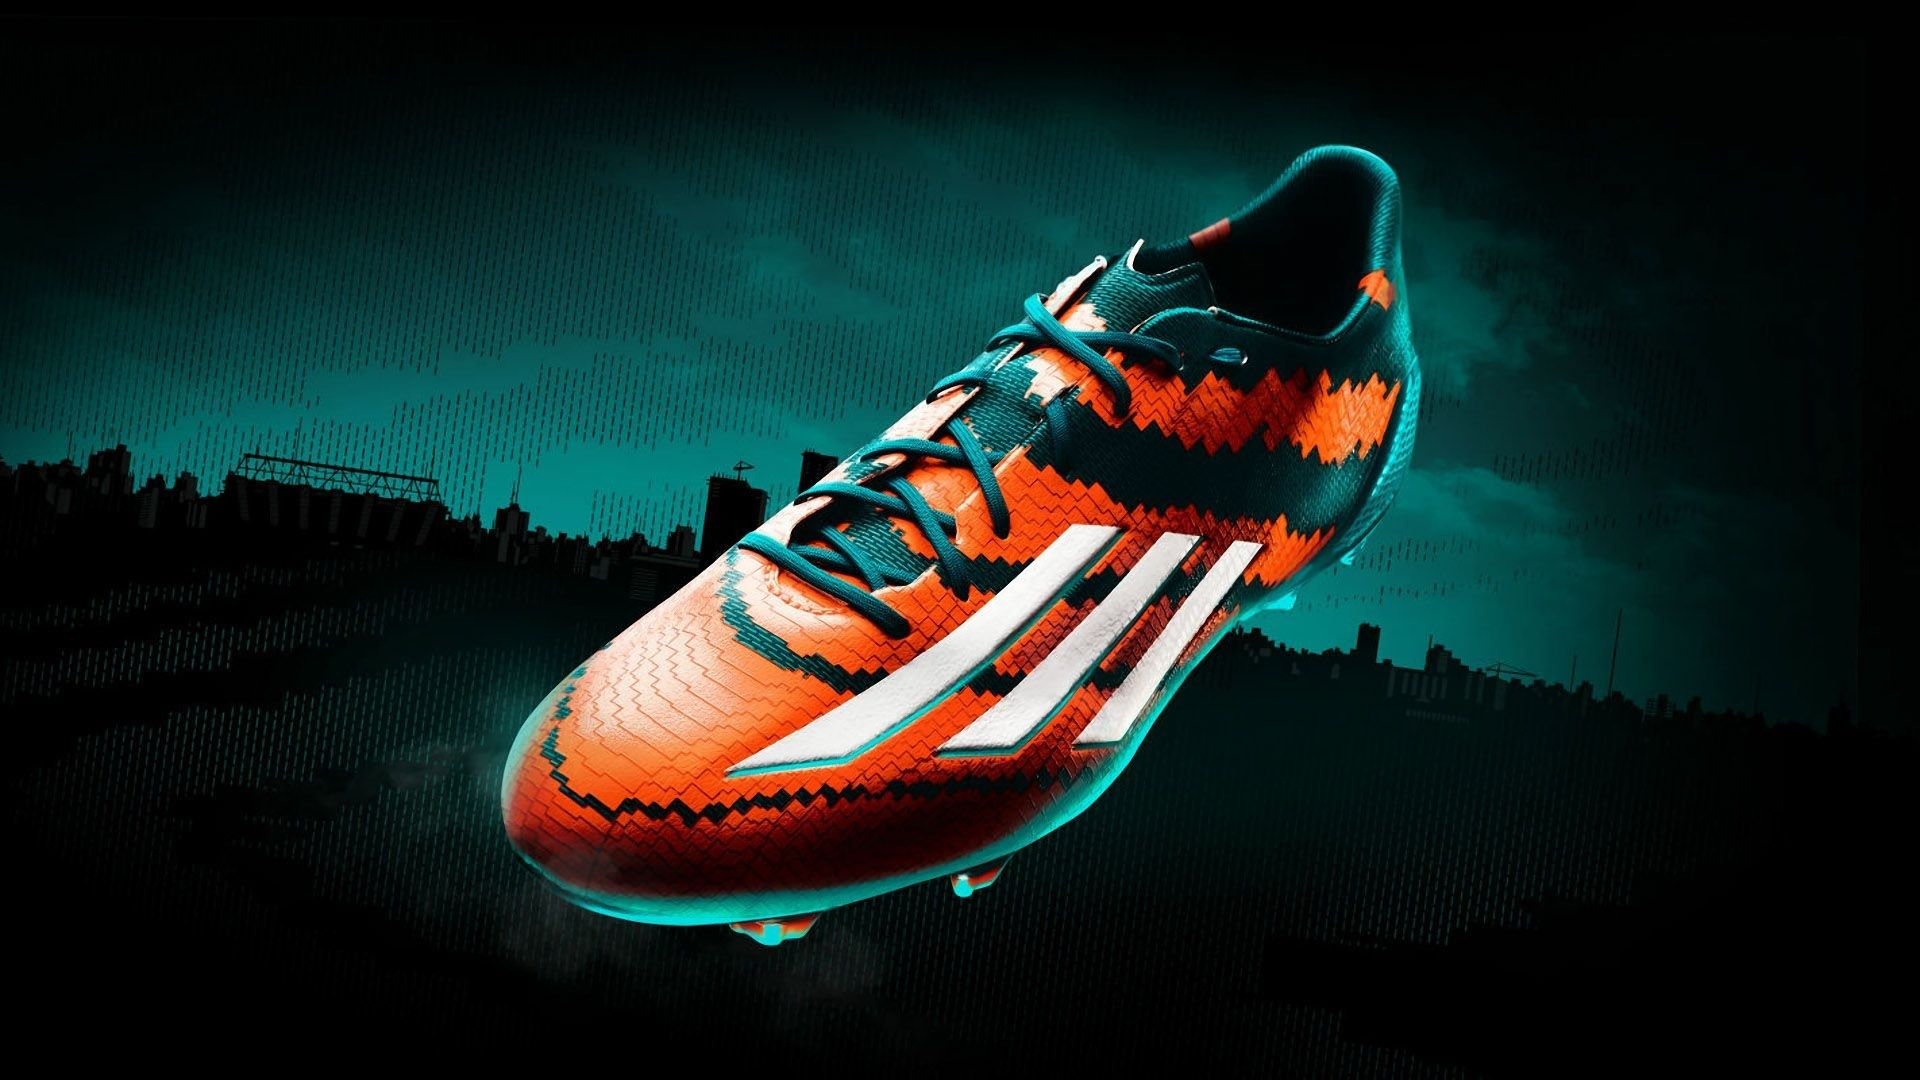 4e712b317886f adidas shoes wallpapers hd free download Messi Childhood, Jordan Shoes  Wallpaper, Messi Shoes,